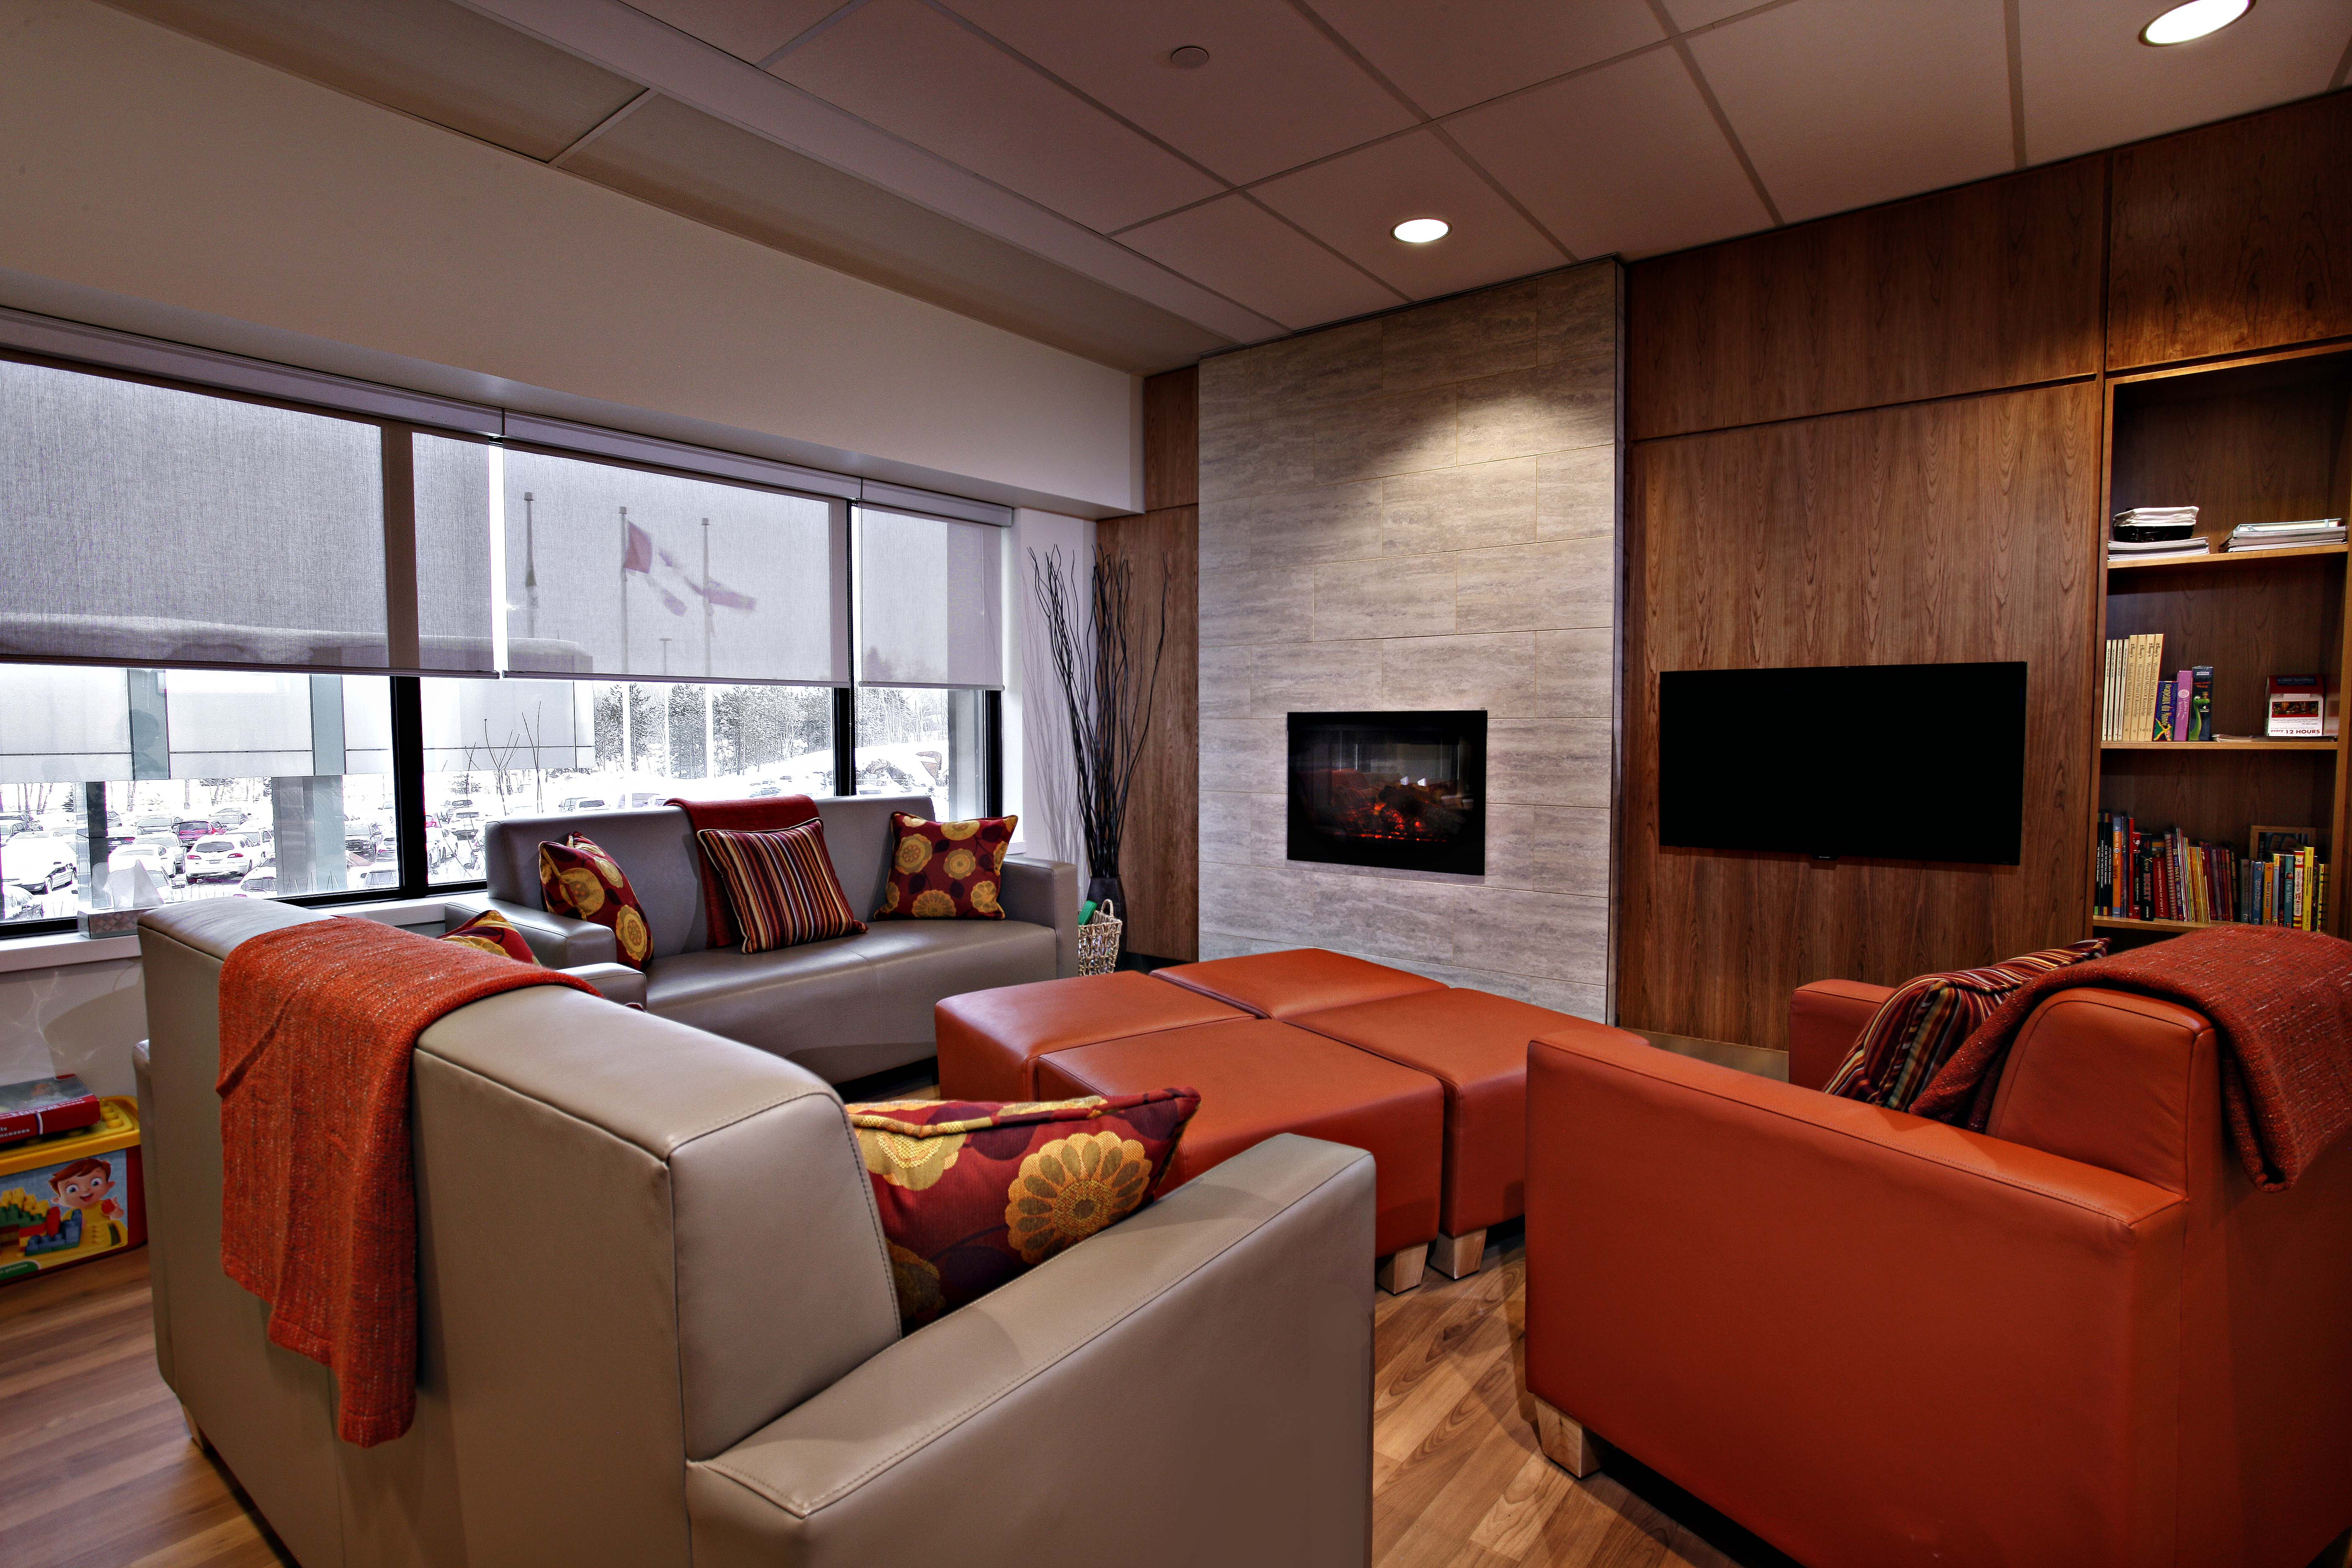 Sudbury welcomes canada s 16th ronald mcdonald family room for Ronald mcdonald family room